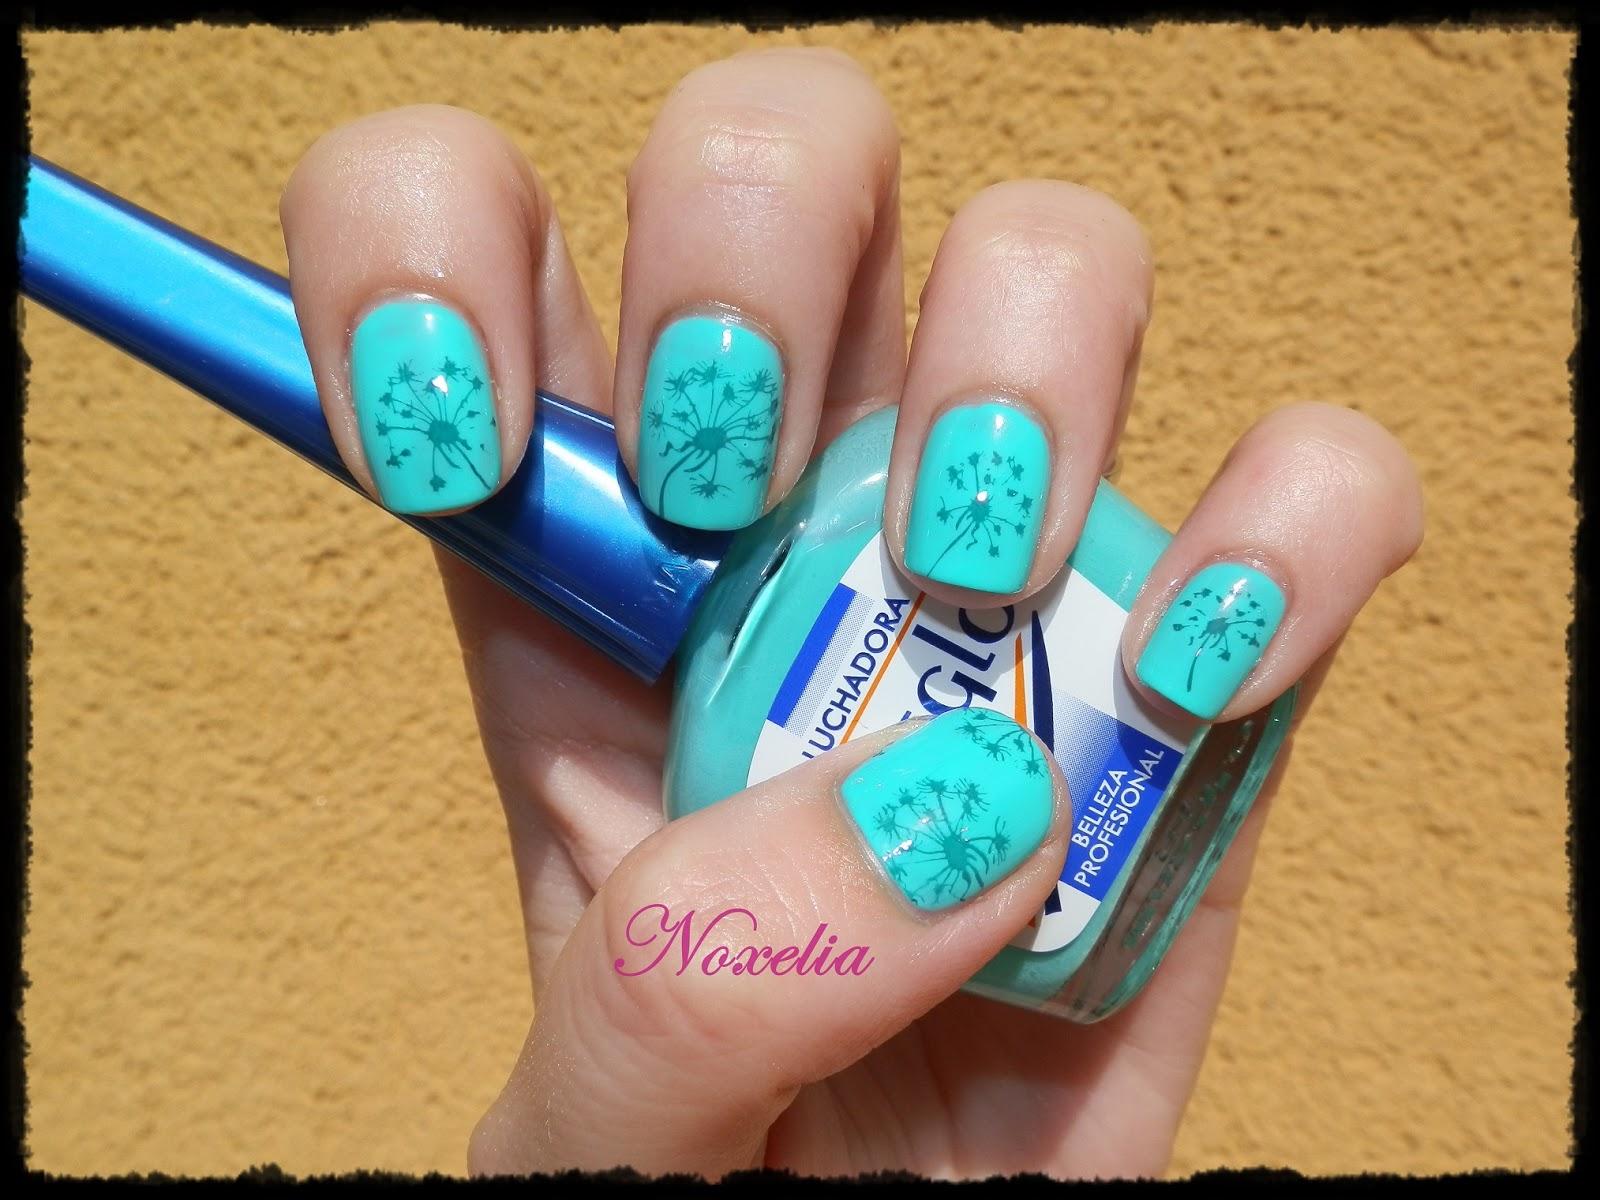 Noxelia: Stamping nail art: Look de uñas Nº 375. Luchadora de Masglo